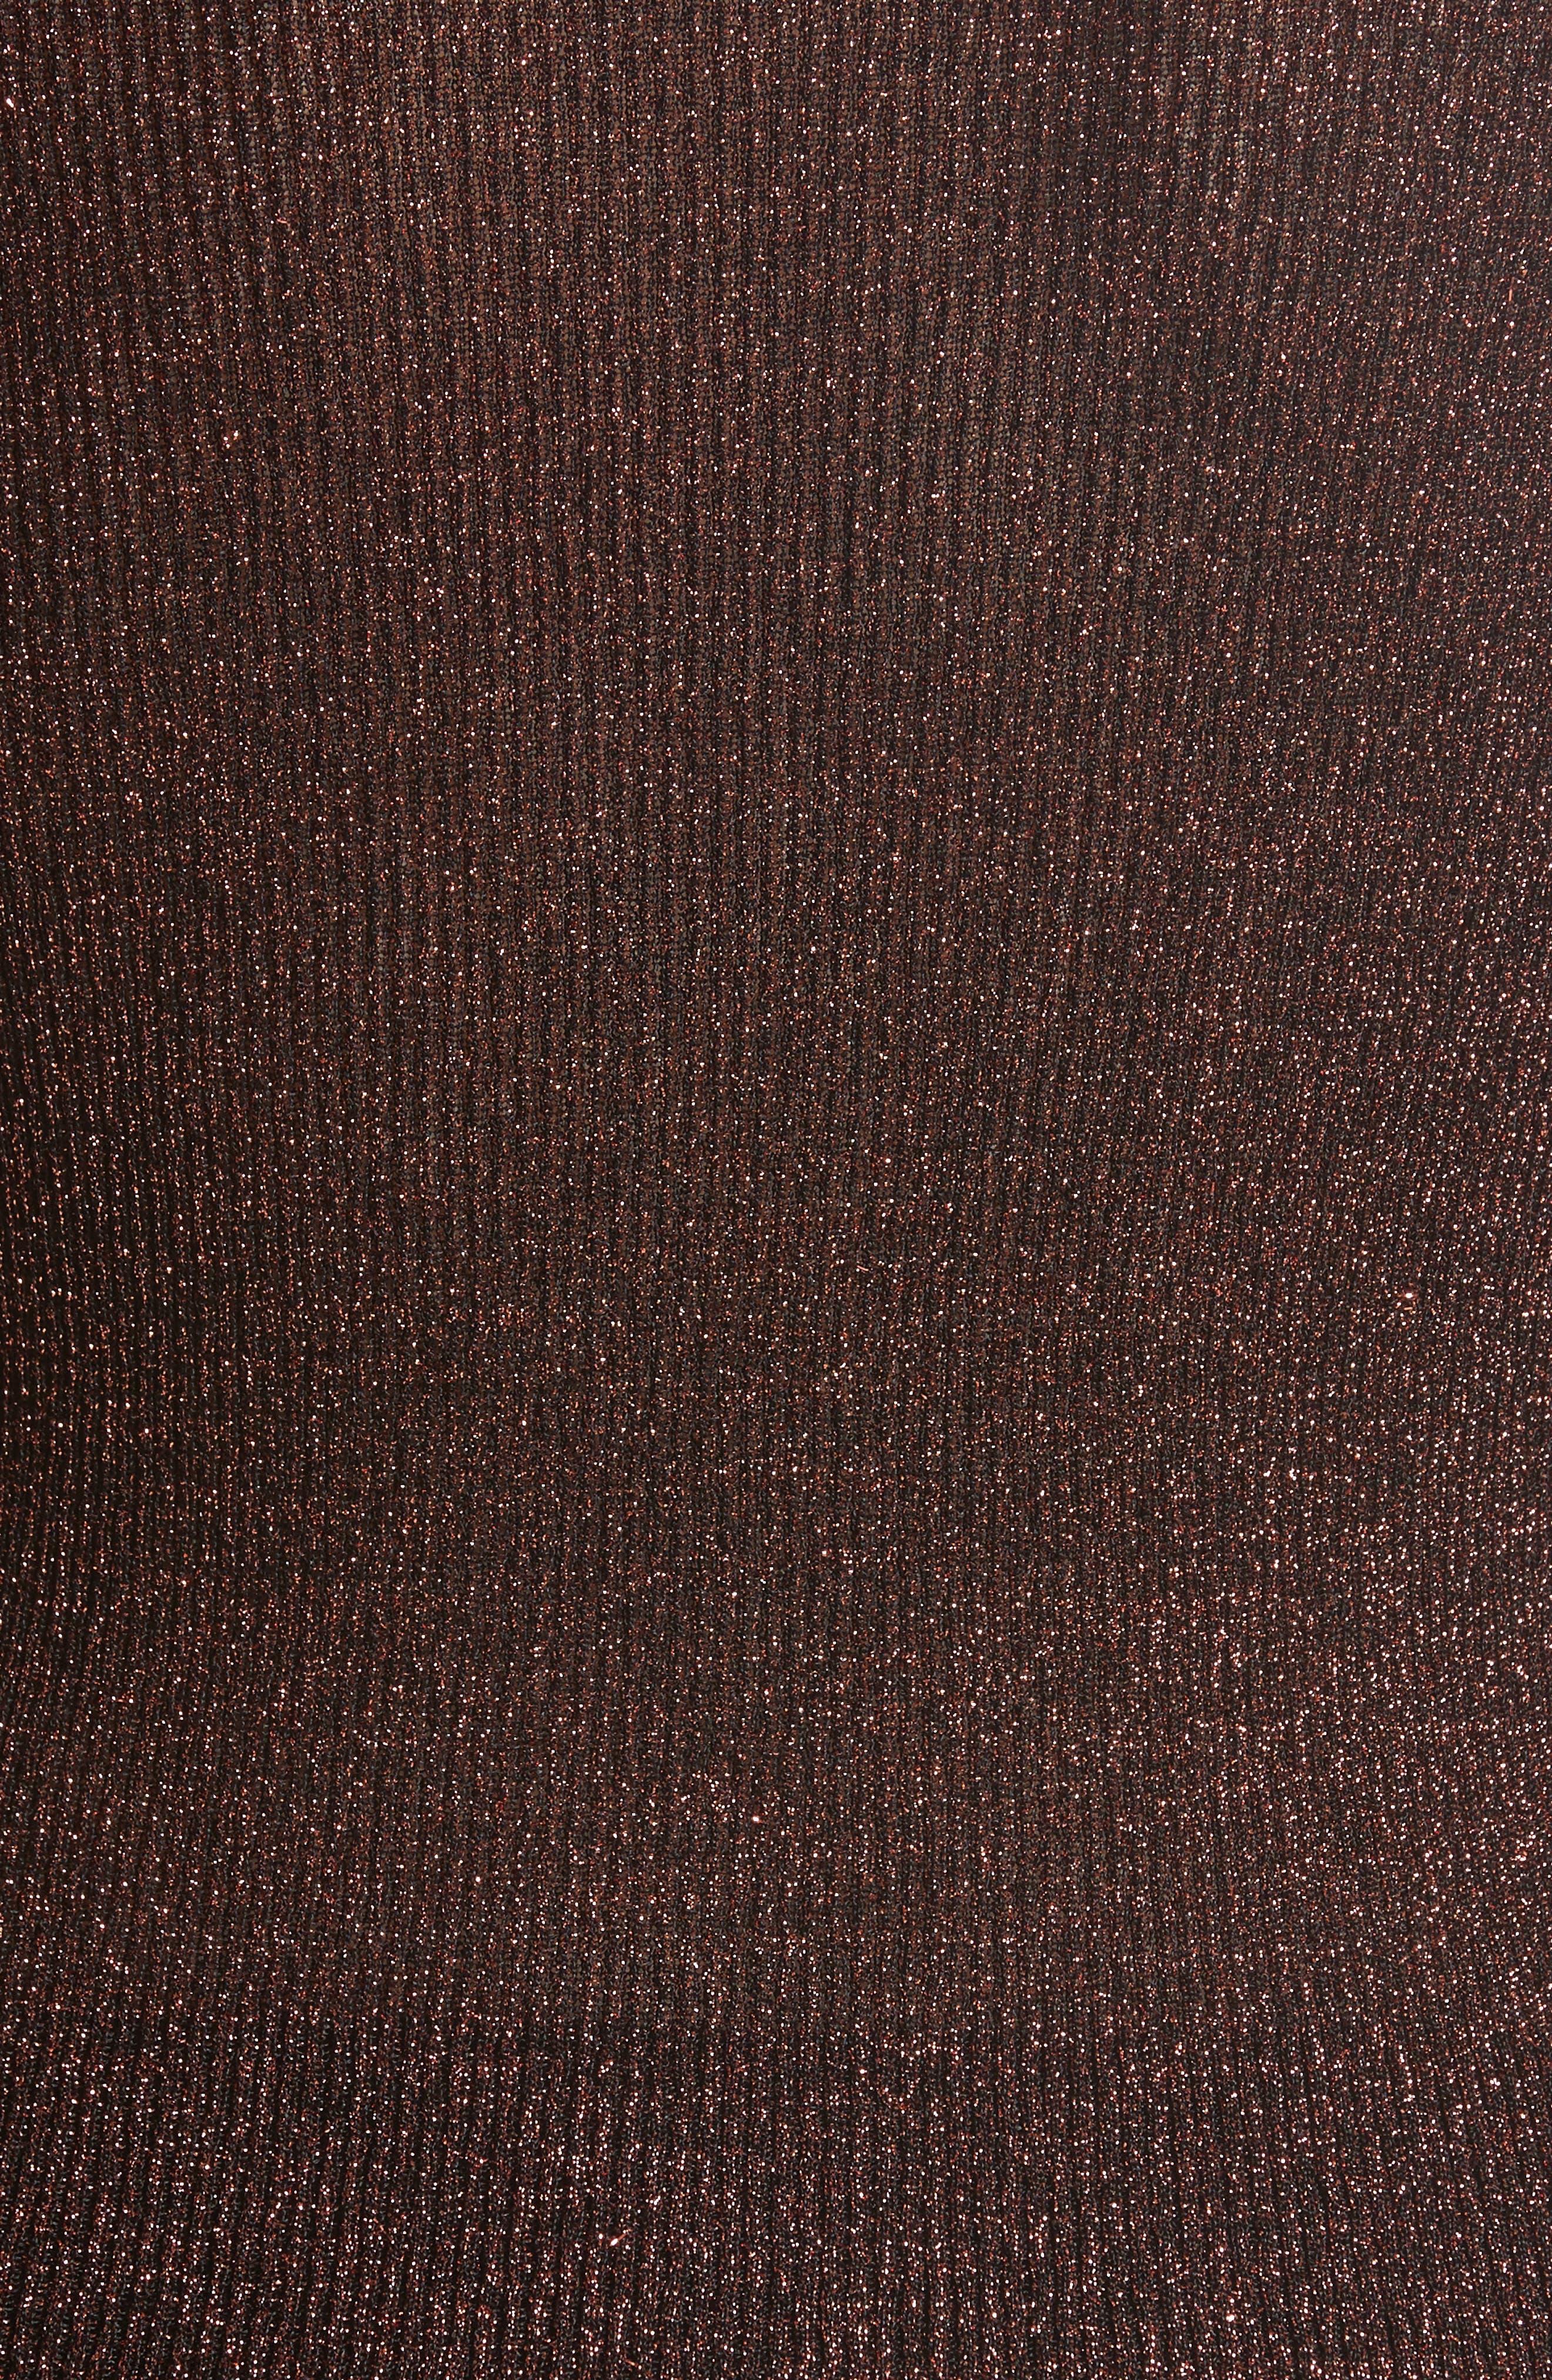 Metallic Knit Turtleneck,                             Alternate thumbnail 5, color,                             220